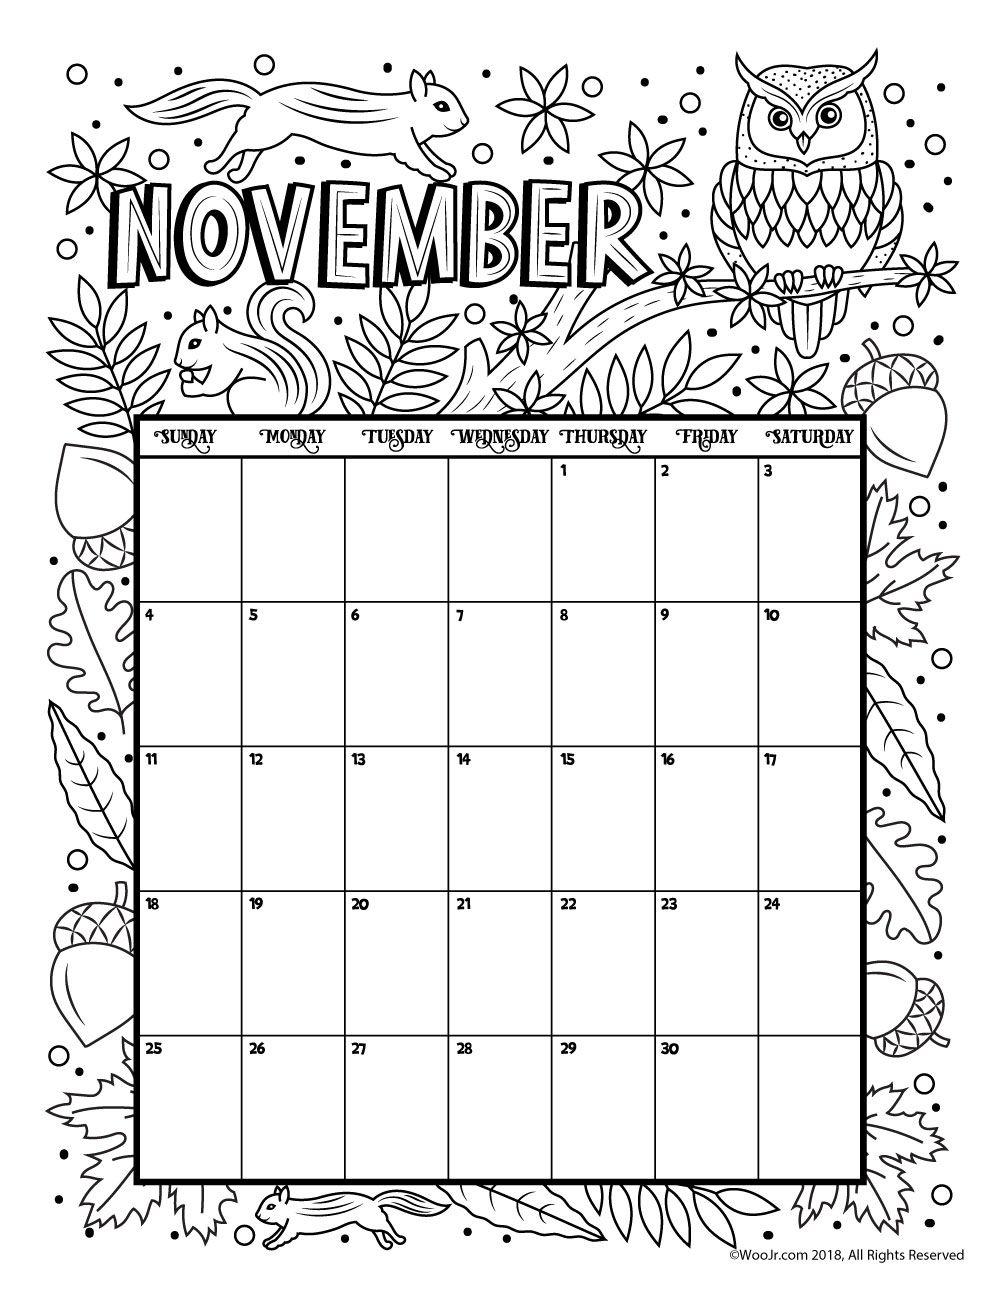 November 2018 Calendar Printable November 2018 Calendar Template